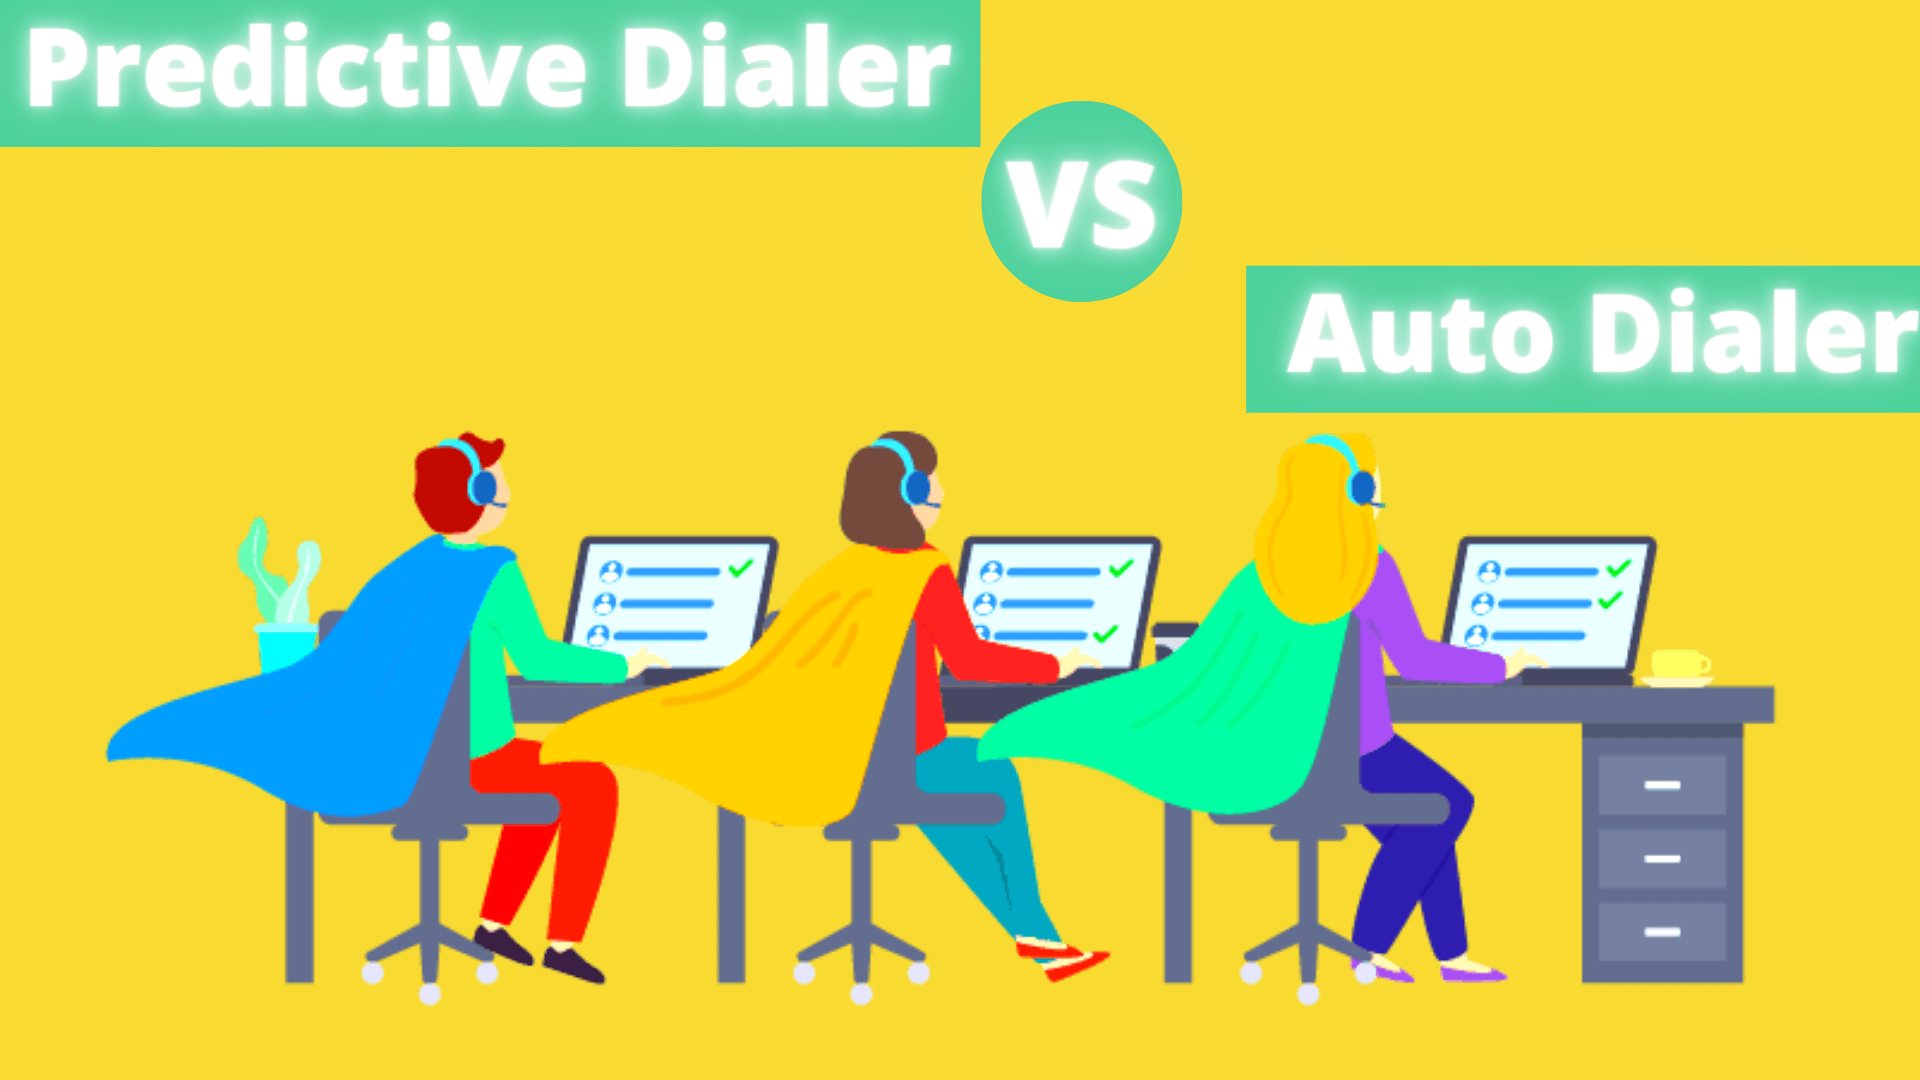 Predictive Dialer Vs Auto Dialer